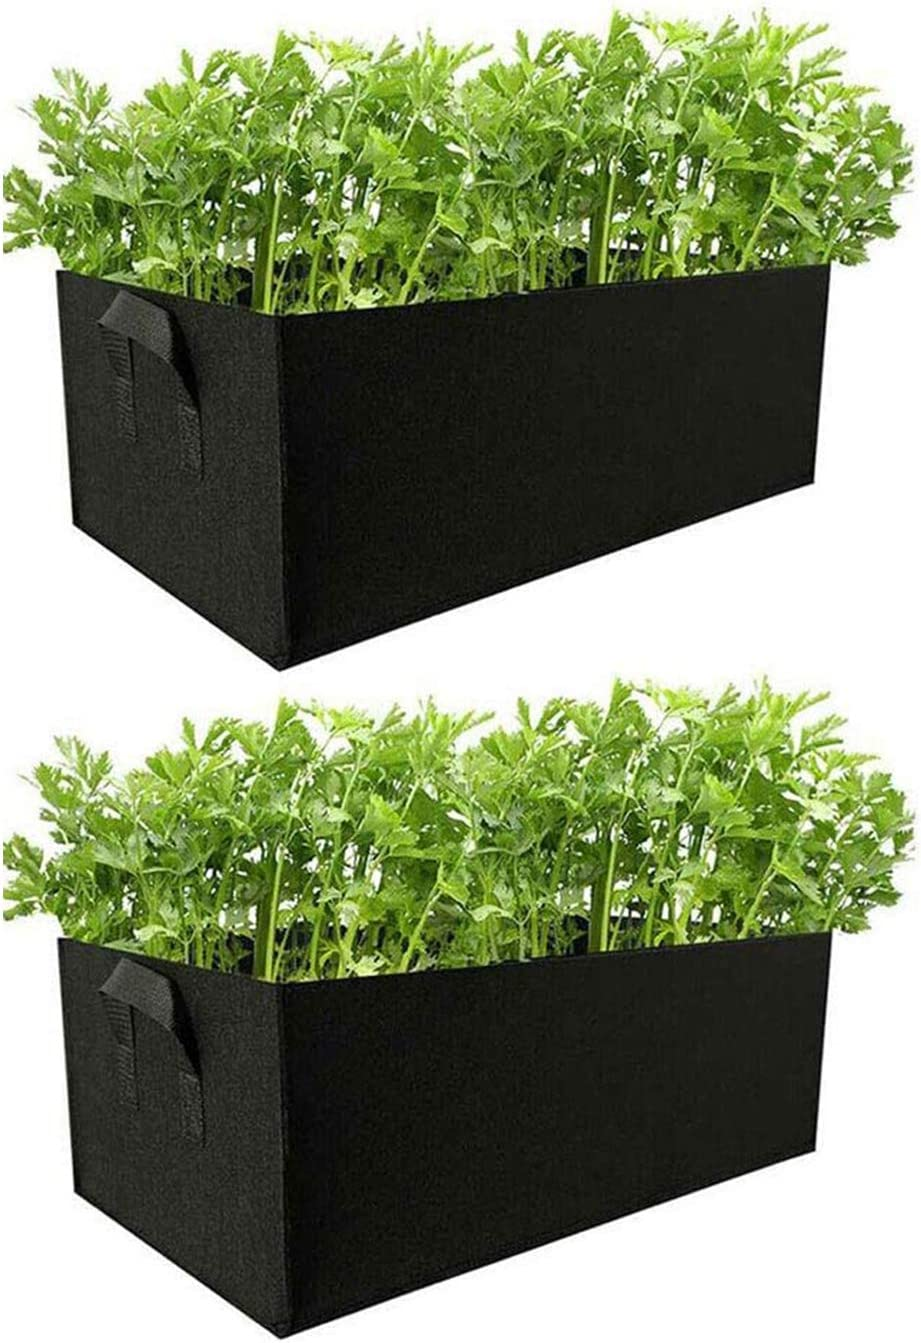 Veg Tomato Fabric Grow Bag Pot Bags Square Garden Planting Bags with Handles (L, Blcak)